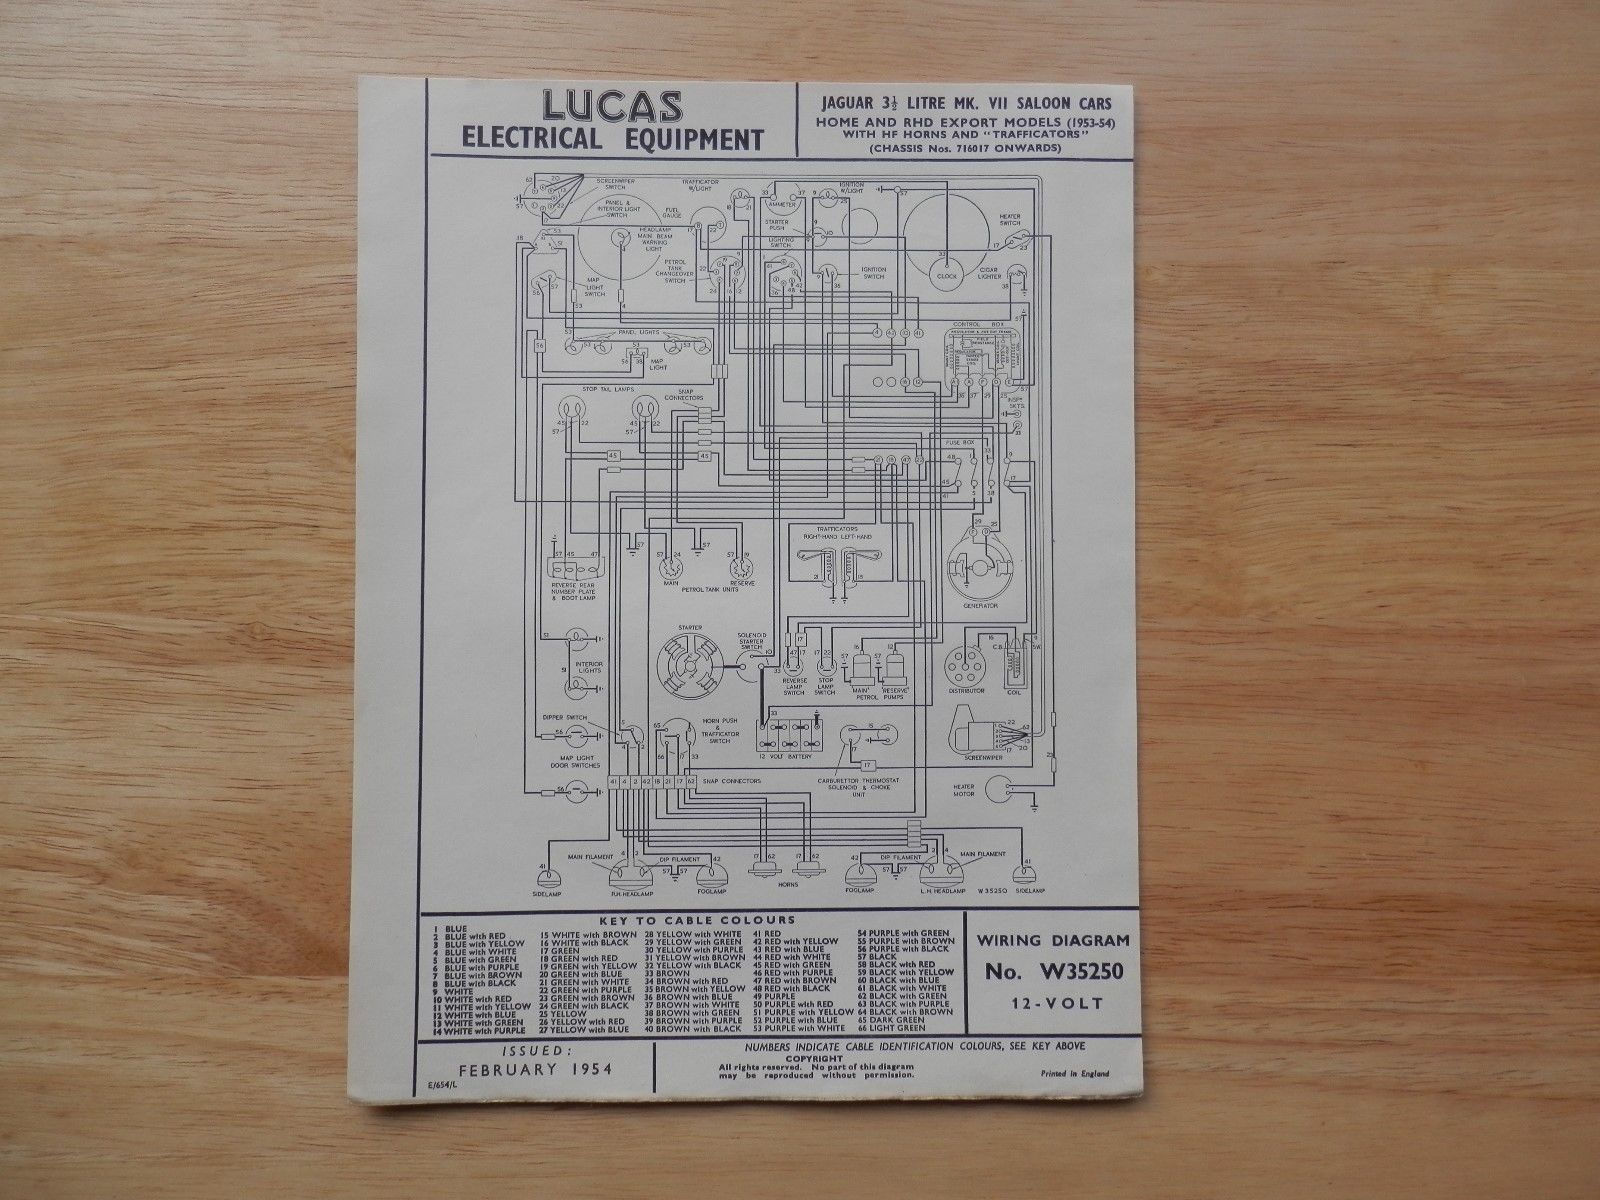 1954 jaguar wiring diagram wiring library 1954 jaguar wiring diagram [ 1600 x 1200 Pixel ]